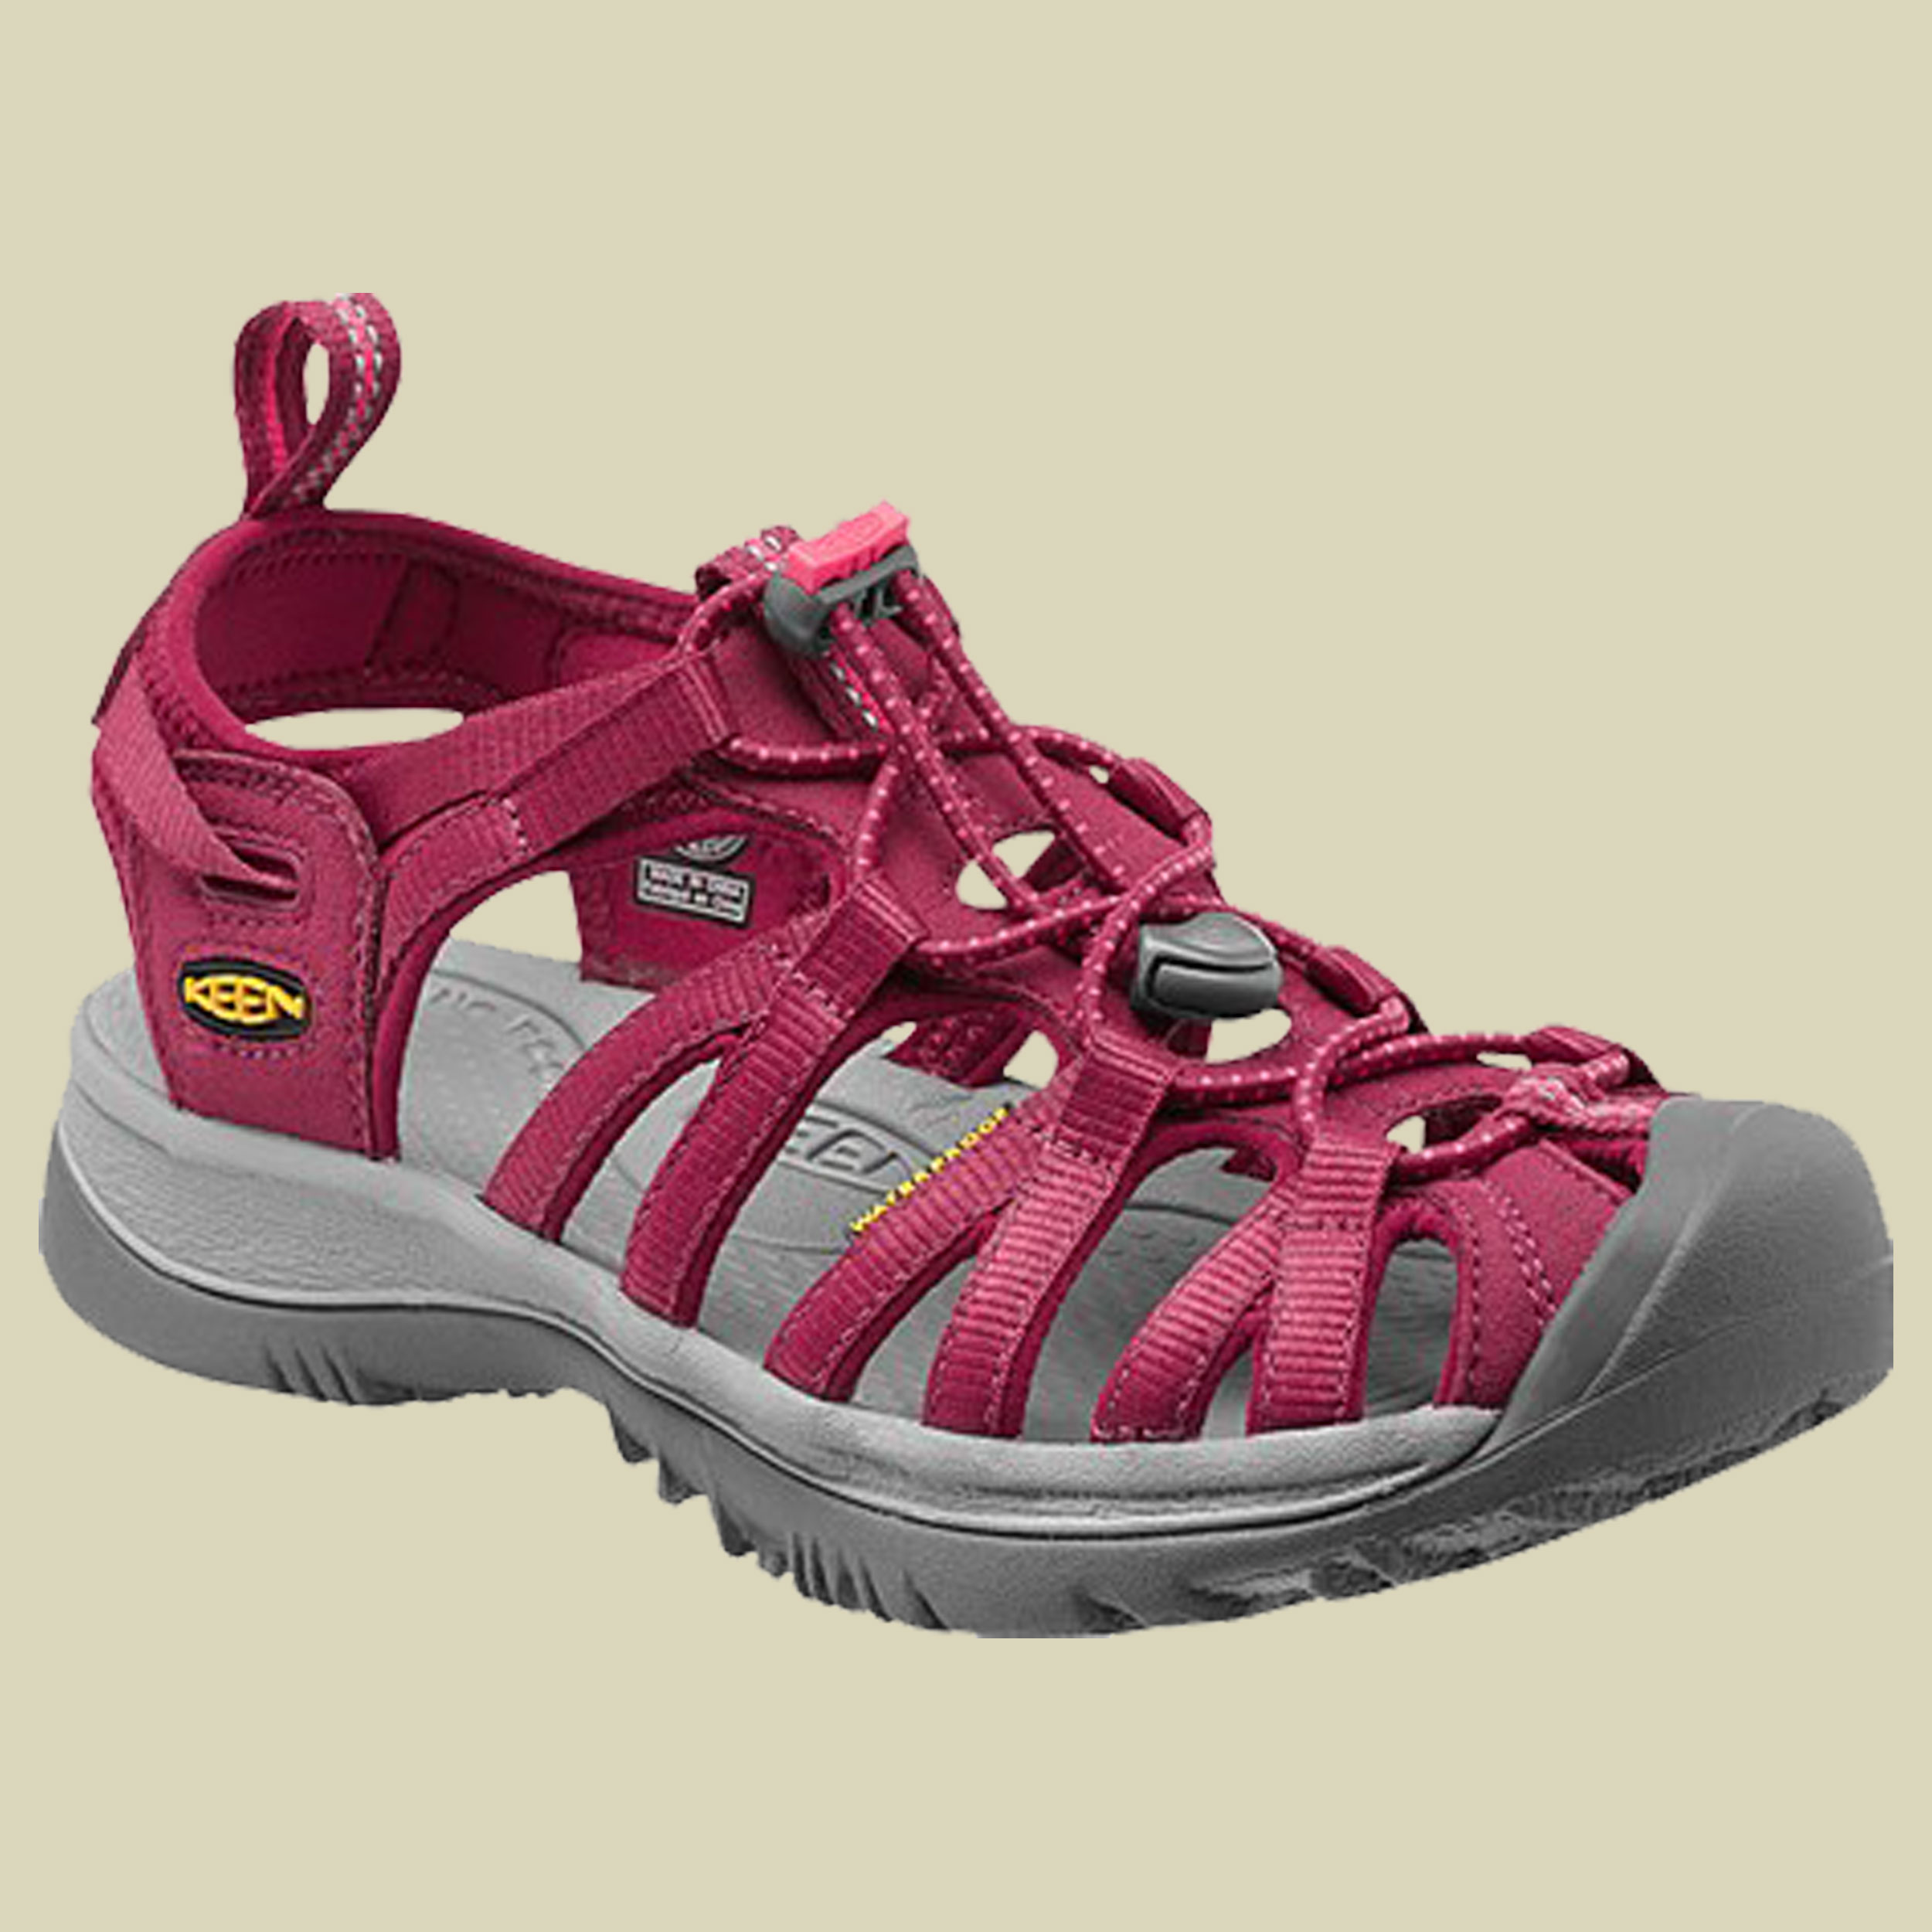 Keen Whisper Women Trekking Sandale Damen Größe UK 4,5 beet red-honeysuckle 834935ba34